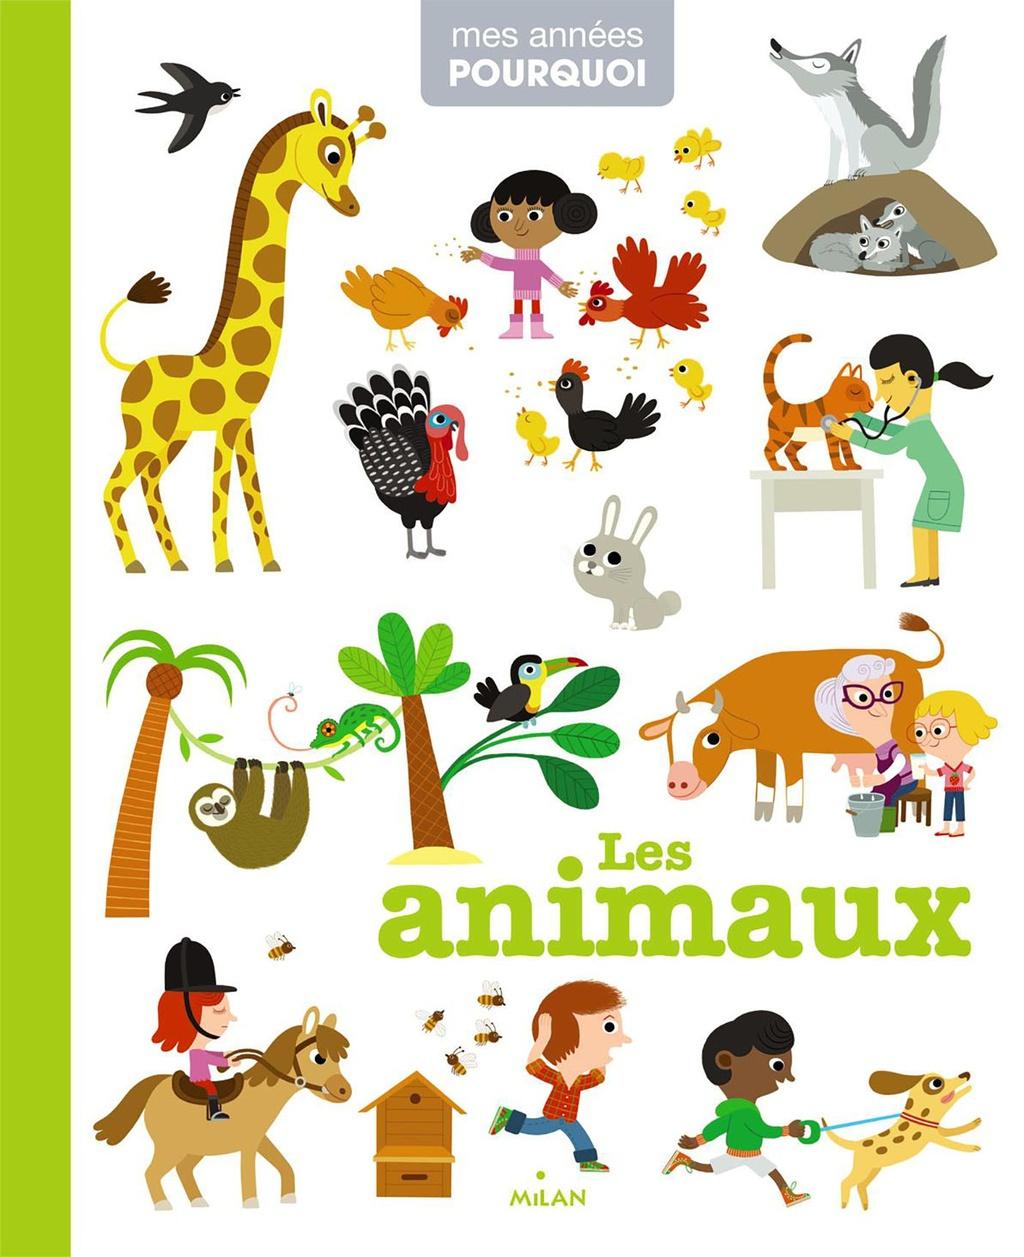 Les Animaux - Editions Milan tout Animaux Ovipares Liste